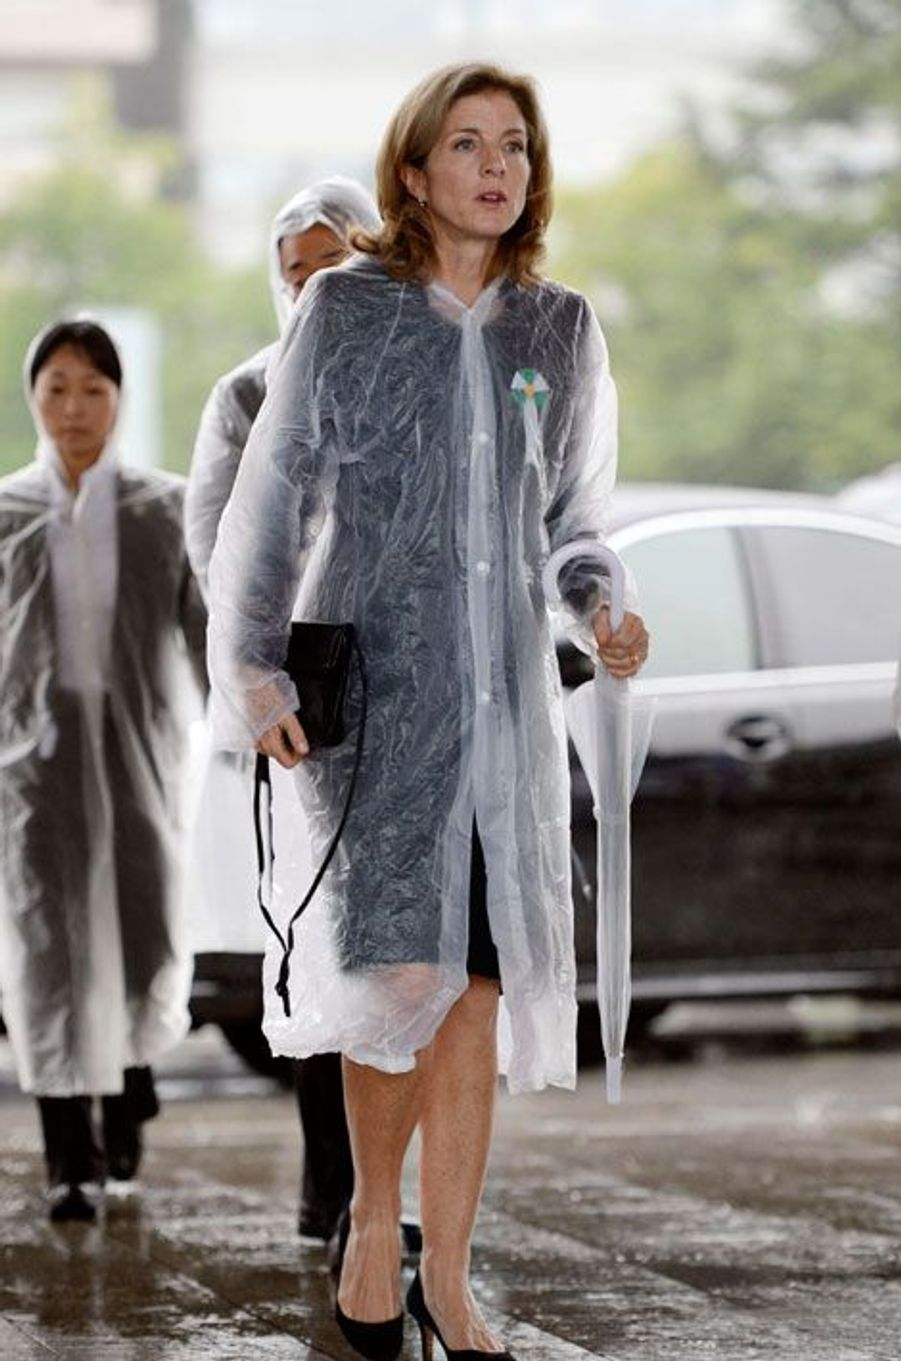 Caroline Kennedy, ambassafrice du Japon aux Etats-Unis